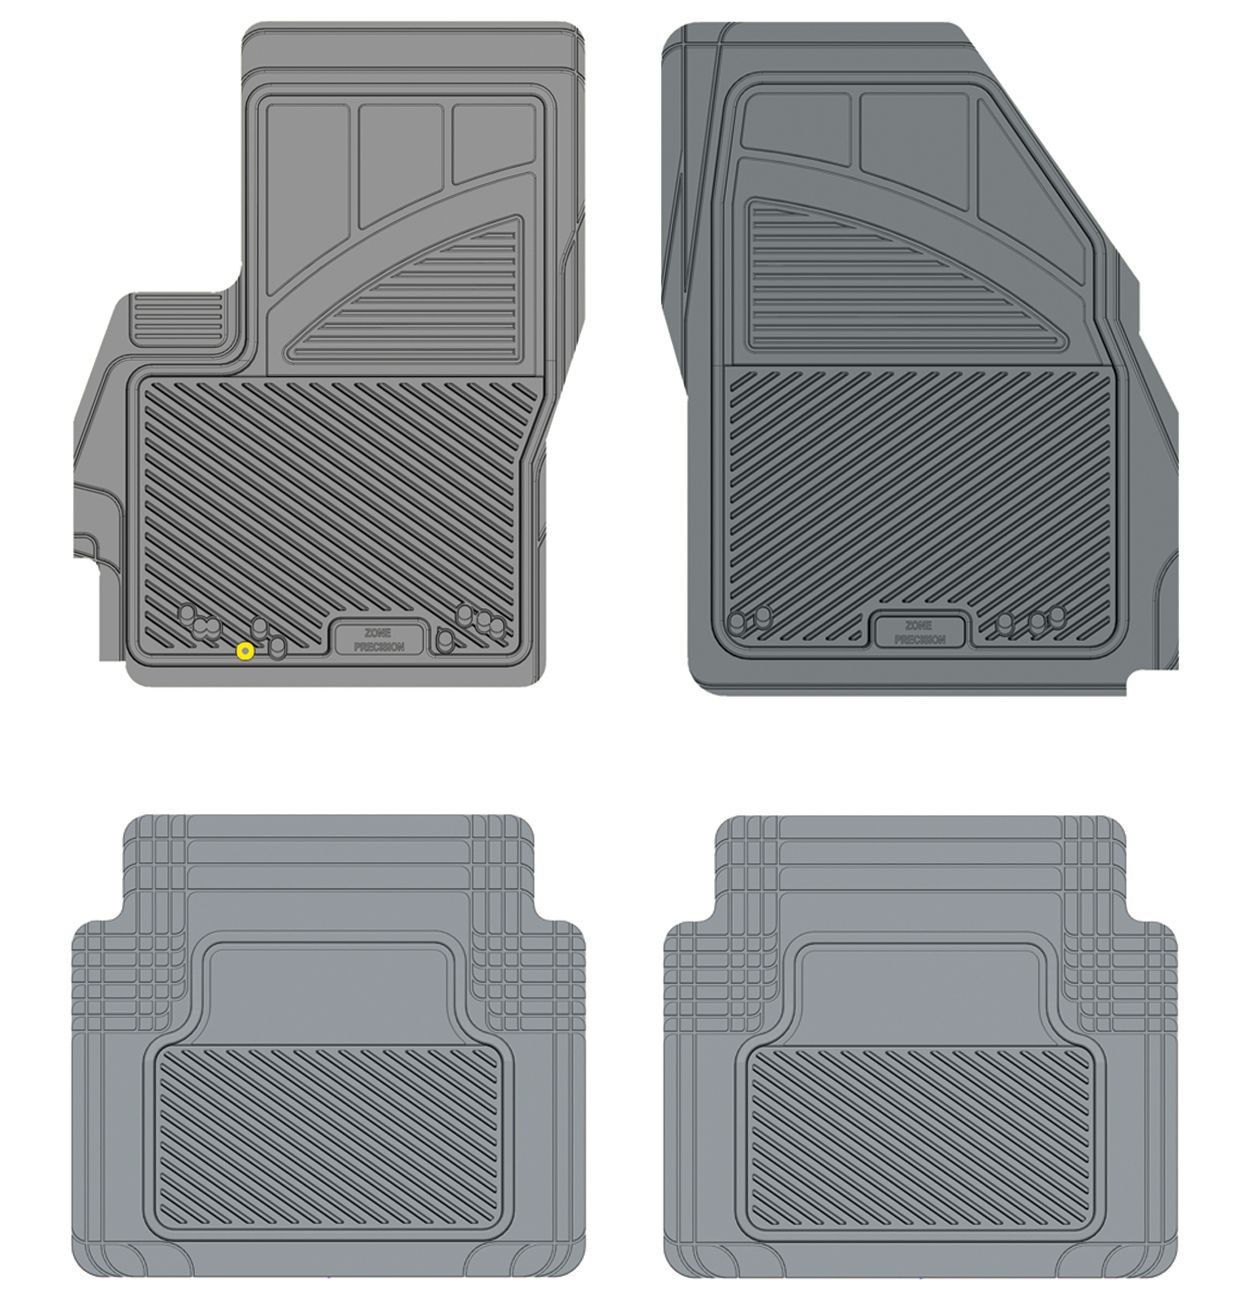 Kustom Fit Koolatron 17553 Grey Kustom Fit Precision All Weather Car Mat for 2006+ Mazda 5